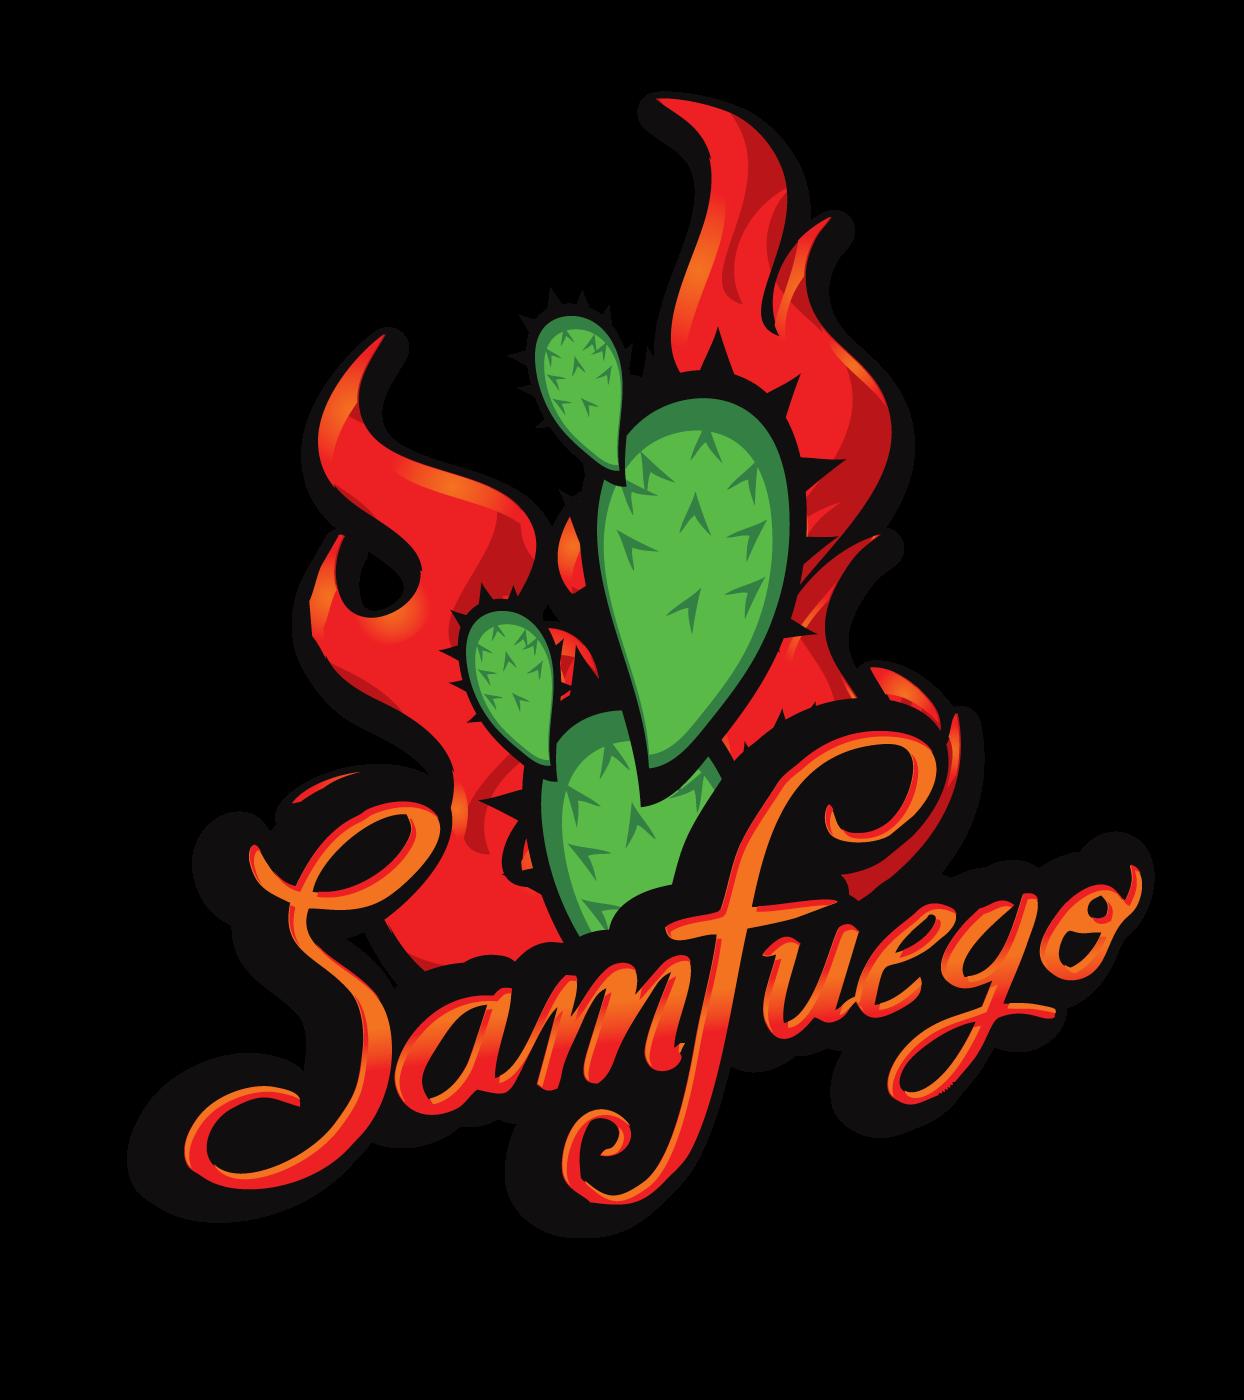 SAMFUEGO_LO_ff.png